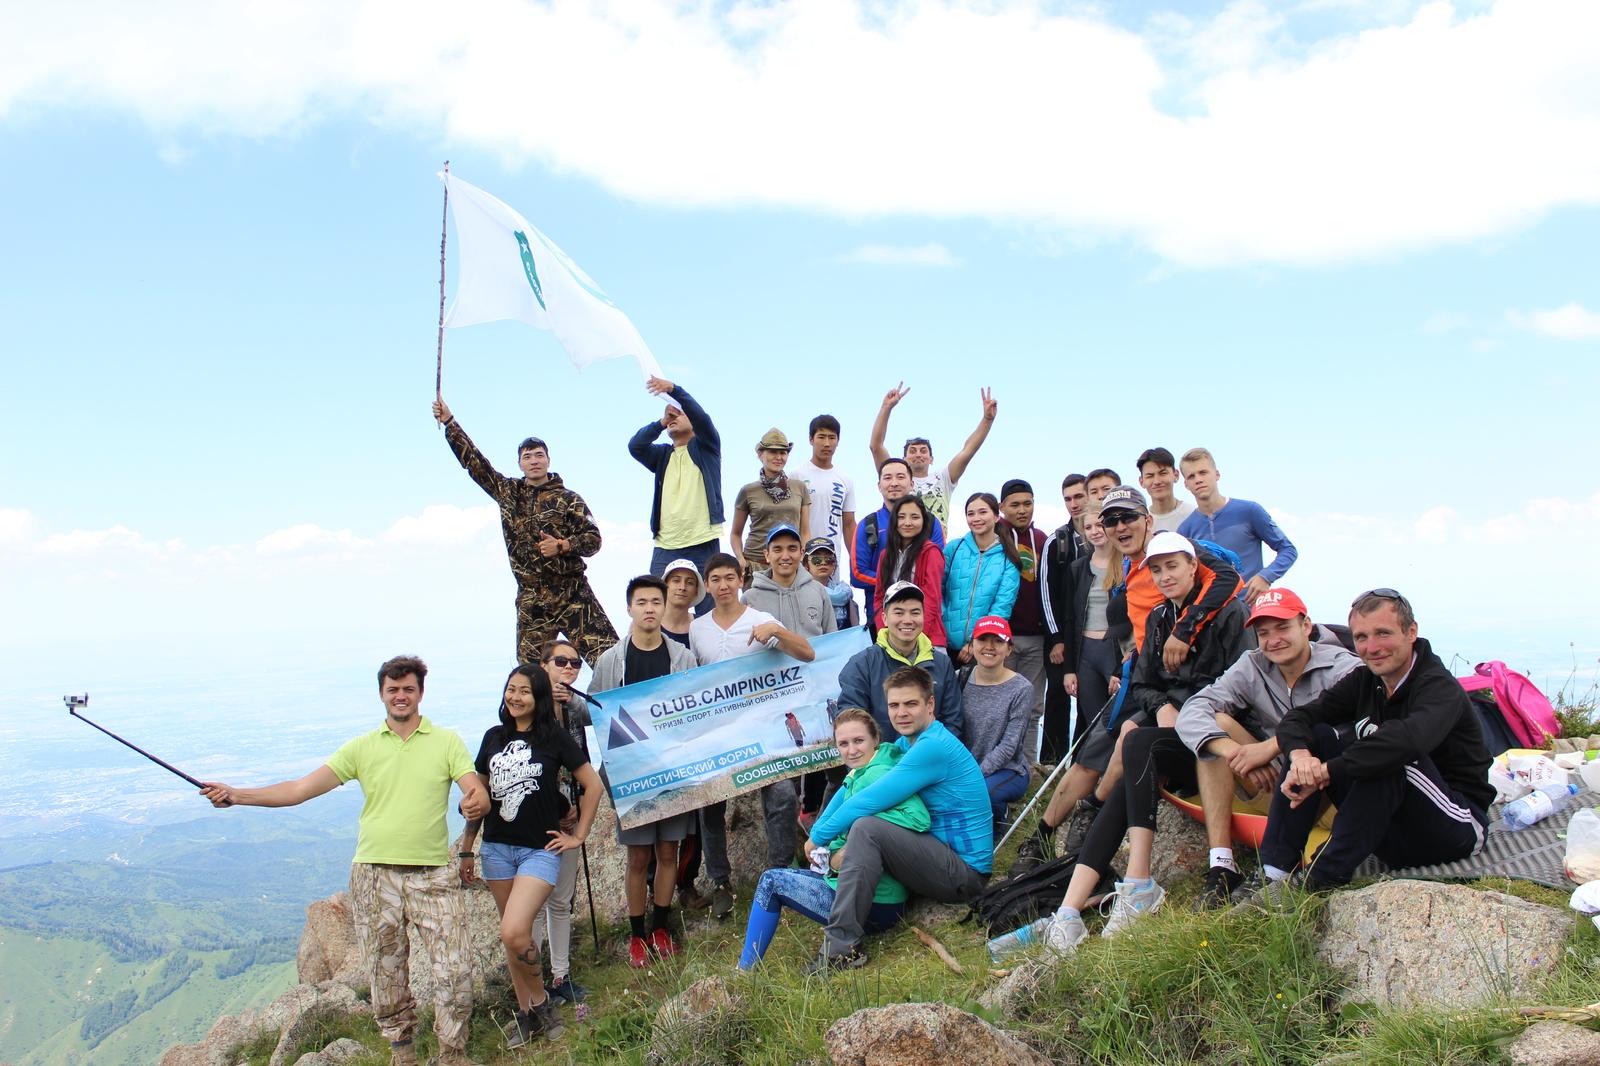 Презентация форума Club.camping.kz на высоте 3200